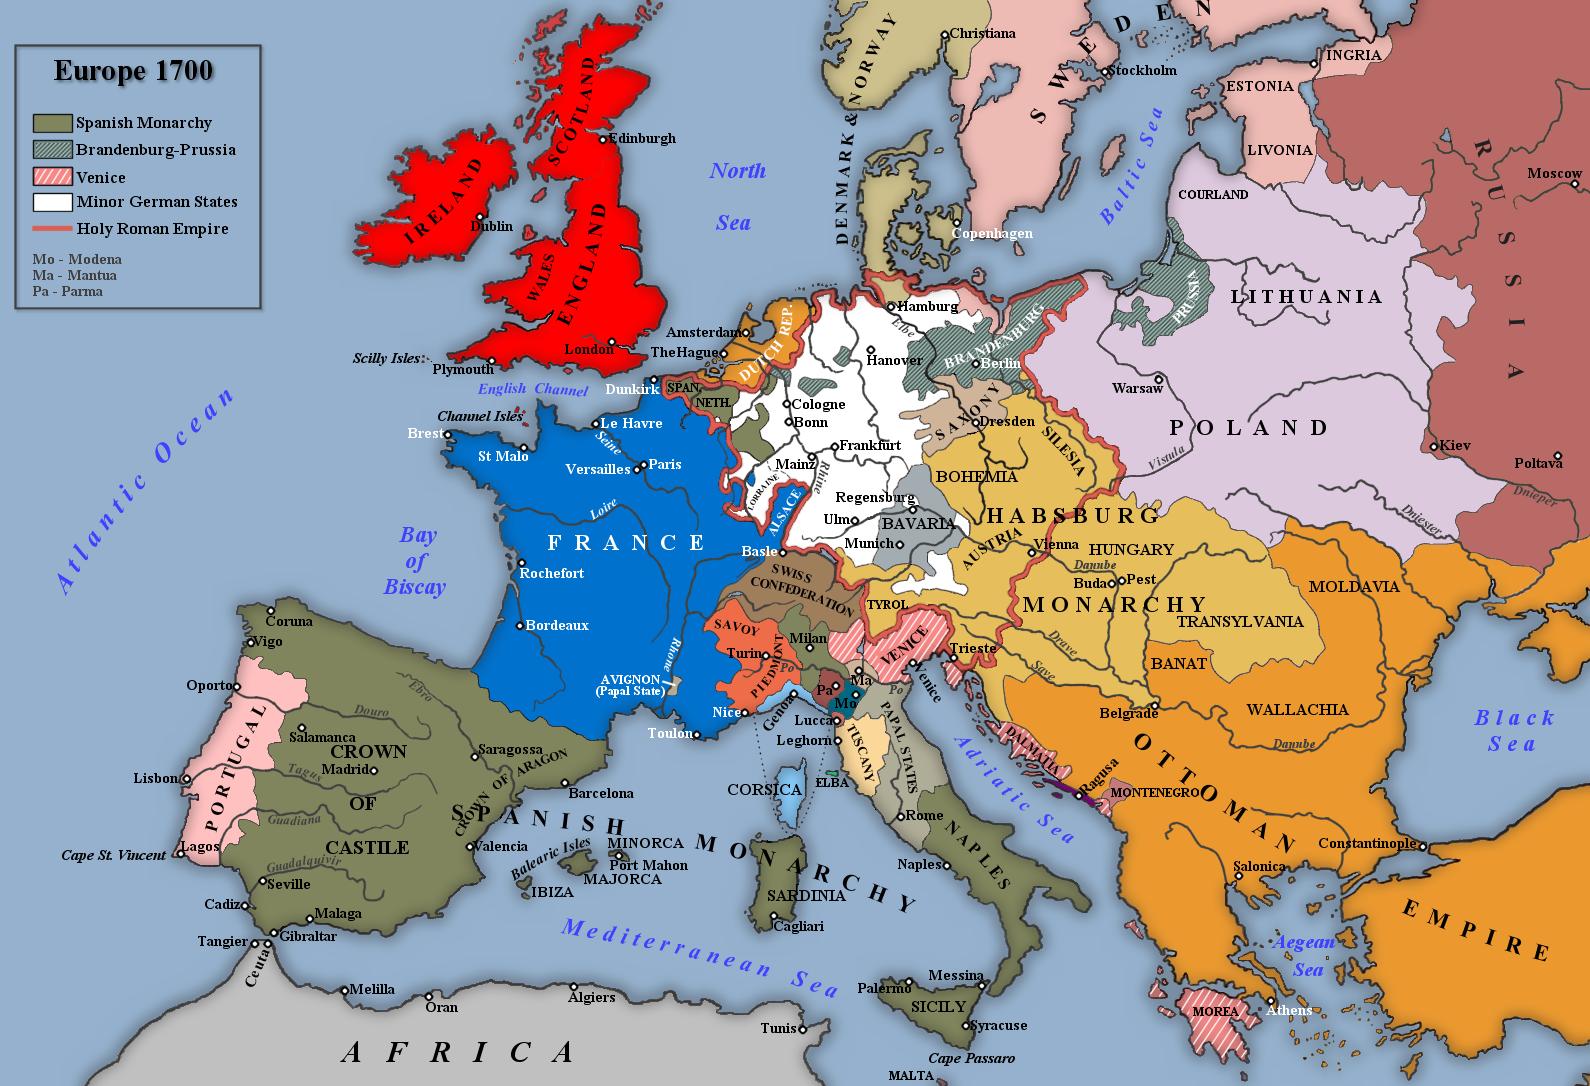 Carte de l'Europe au traité de Ryswick, 1697